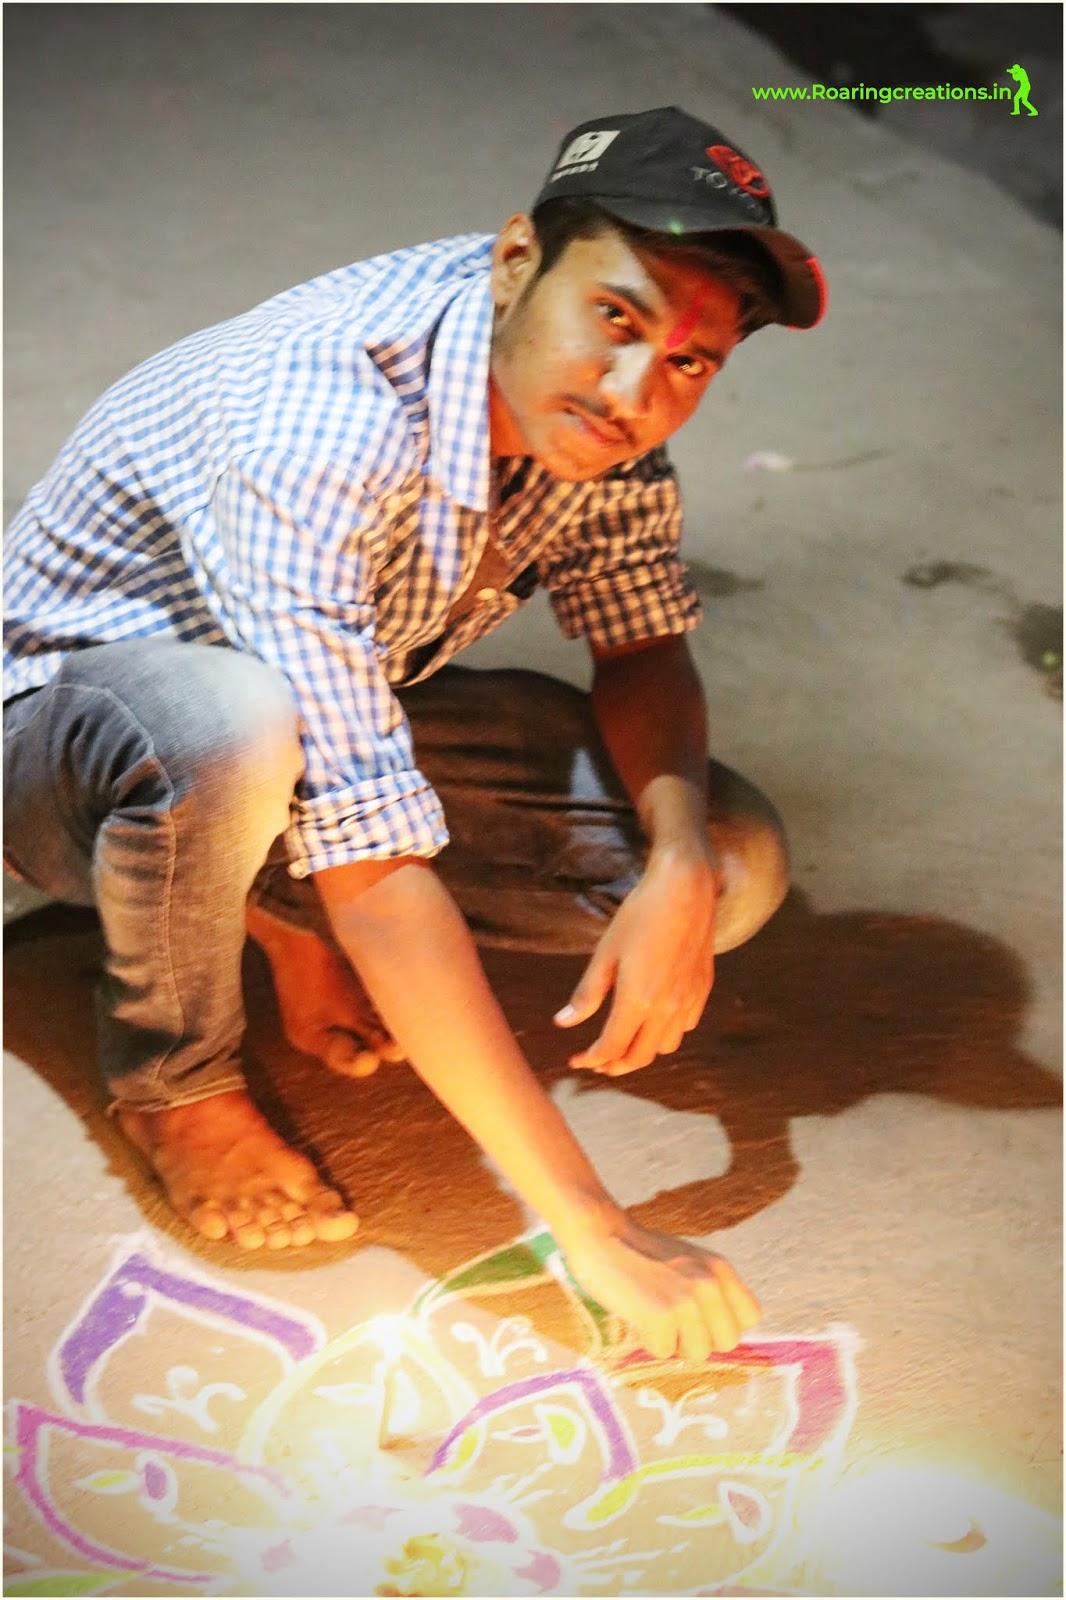 diwali images, diwali celebration, diwali, deepavali, happy diwali images, deepavali images, diwali photo, diwali festival, diwali picture, diwali rangoli images, diya images, deepavali pictures